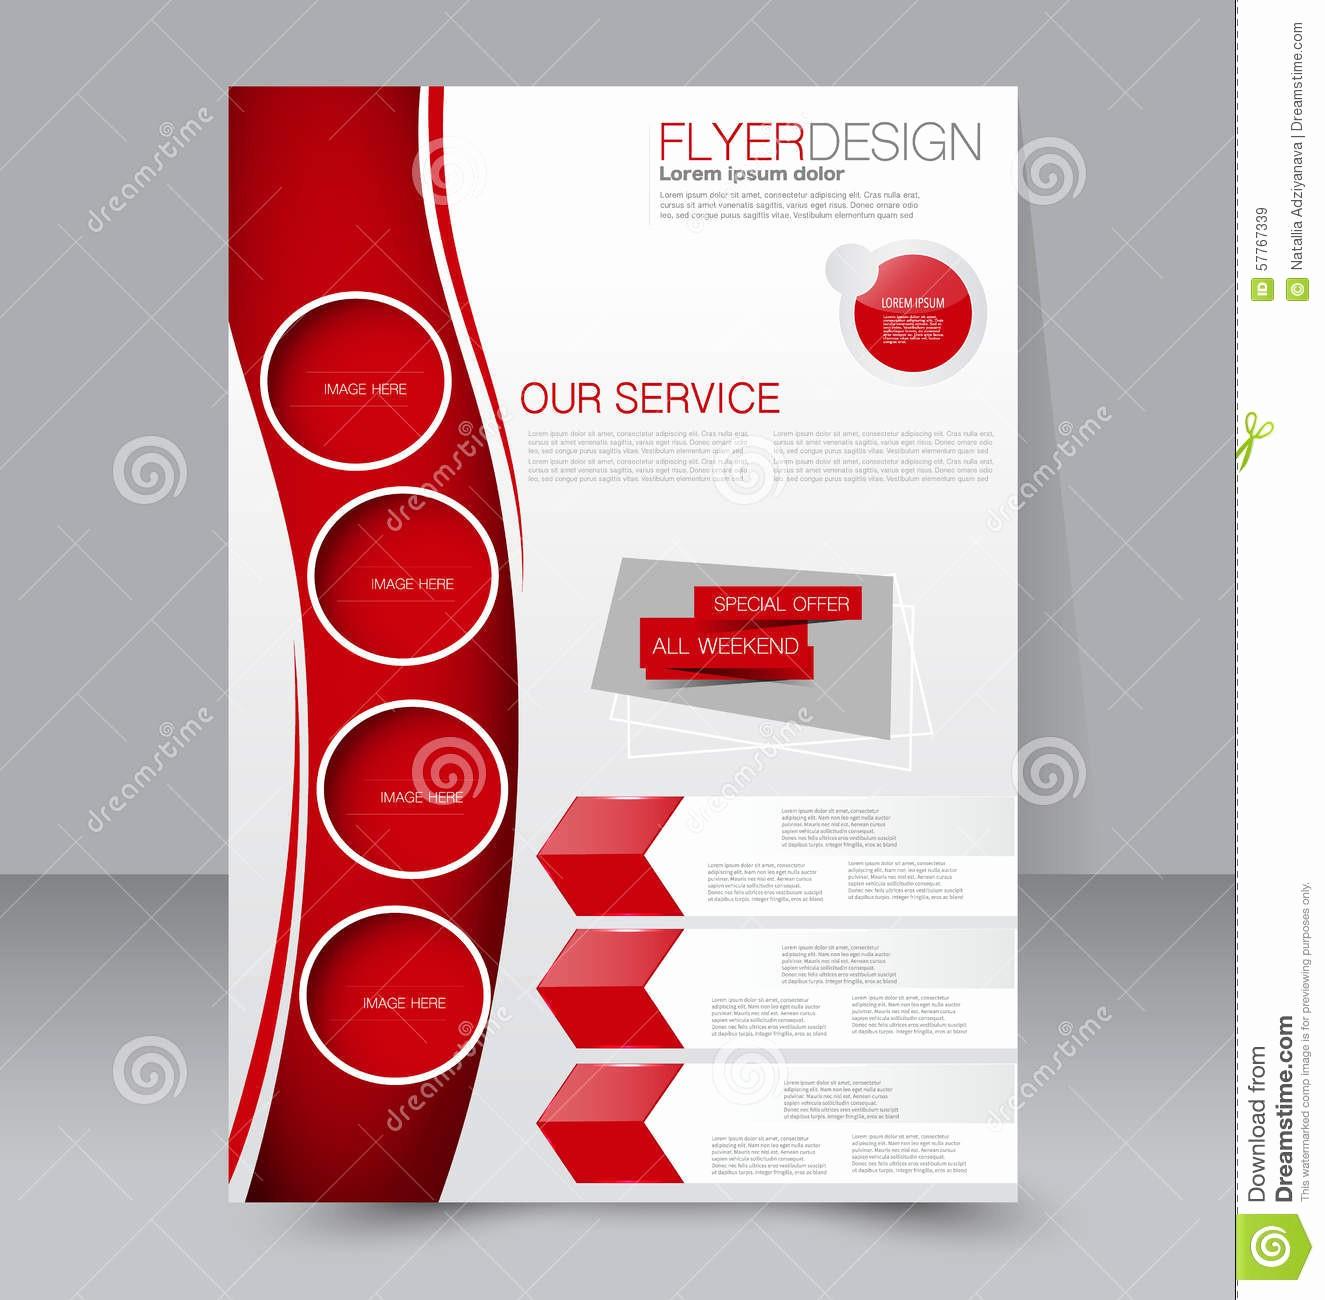 School Brochure Template Free Download Luxury Flyer Template Business Brochure Editable Poster Design